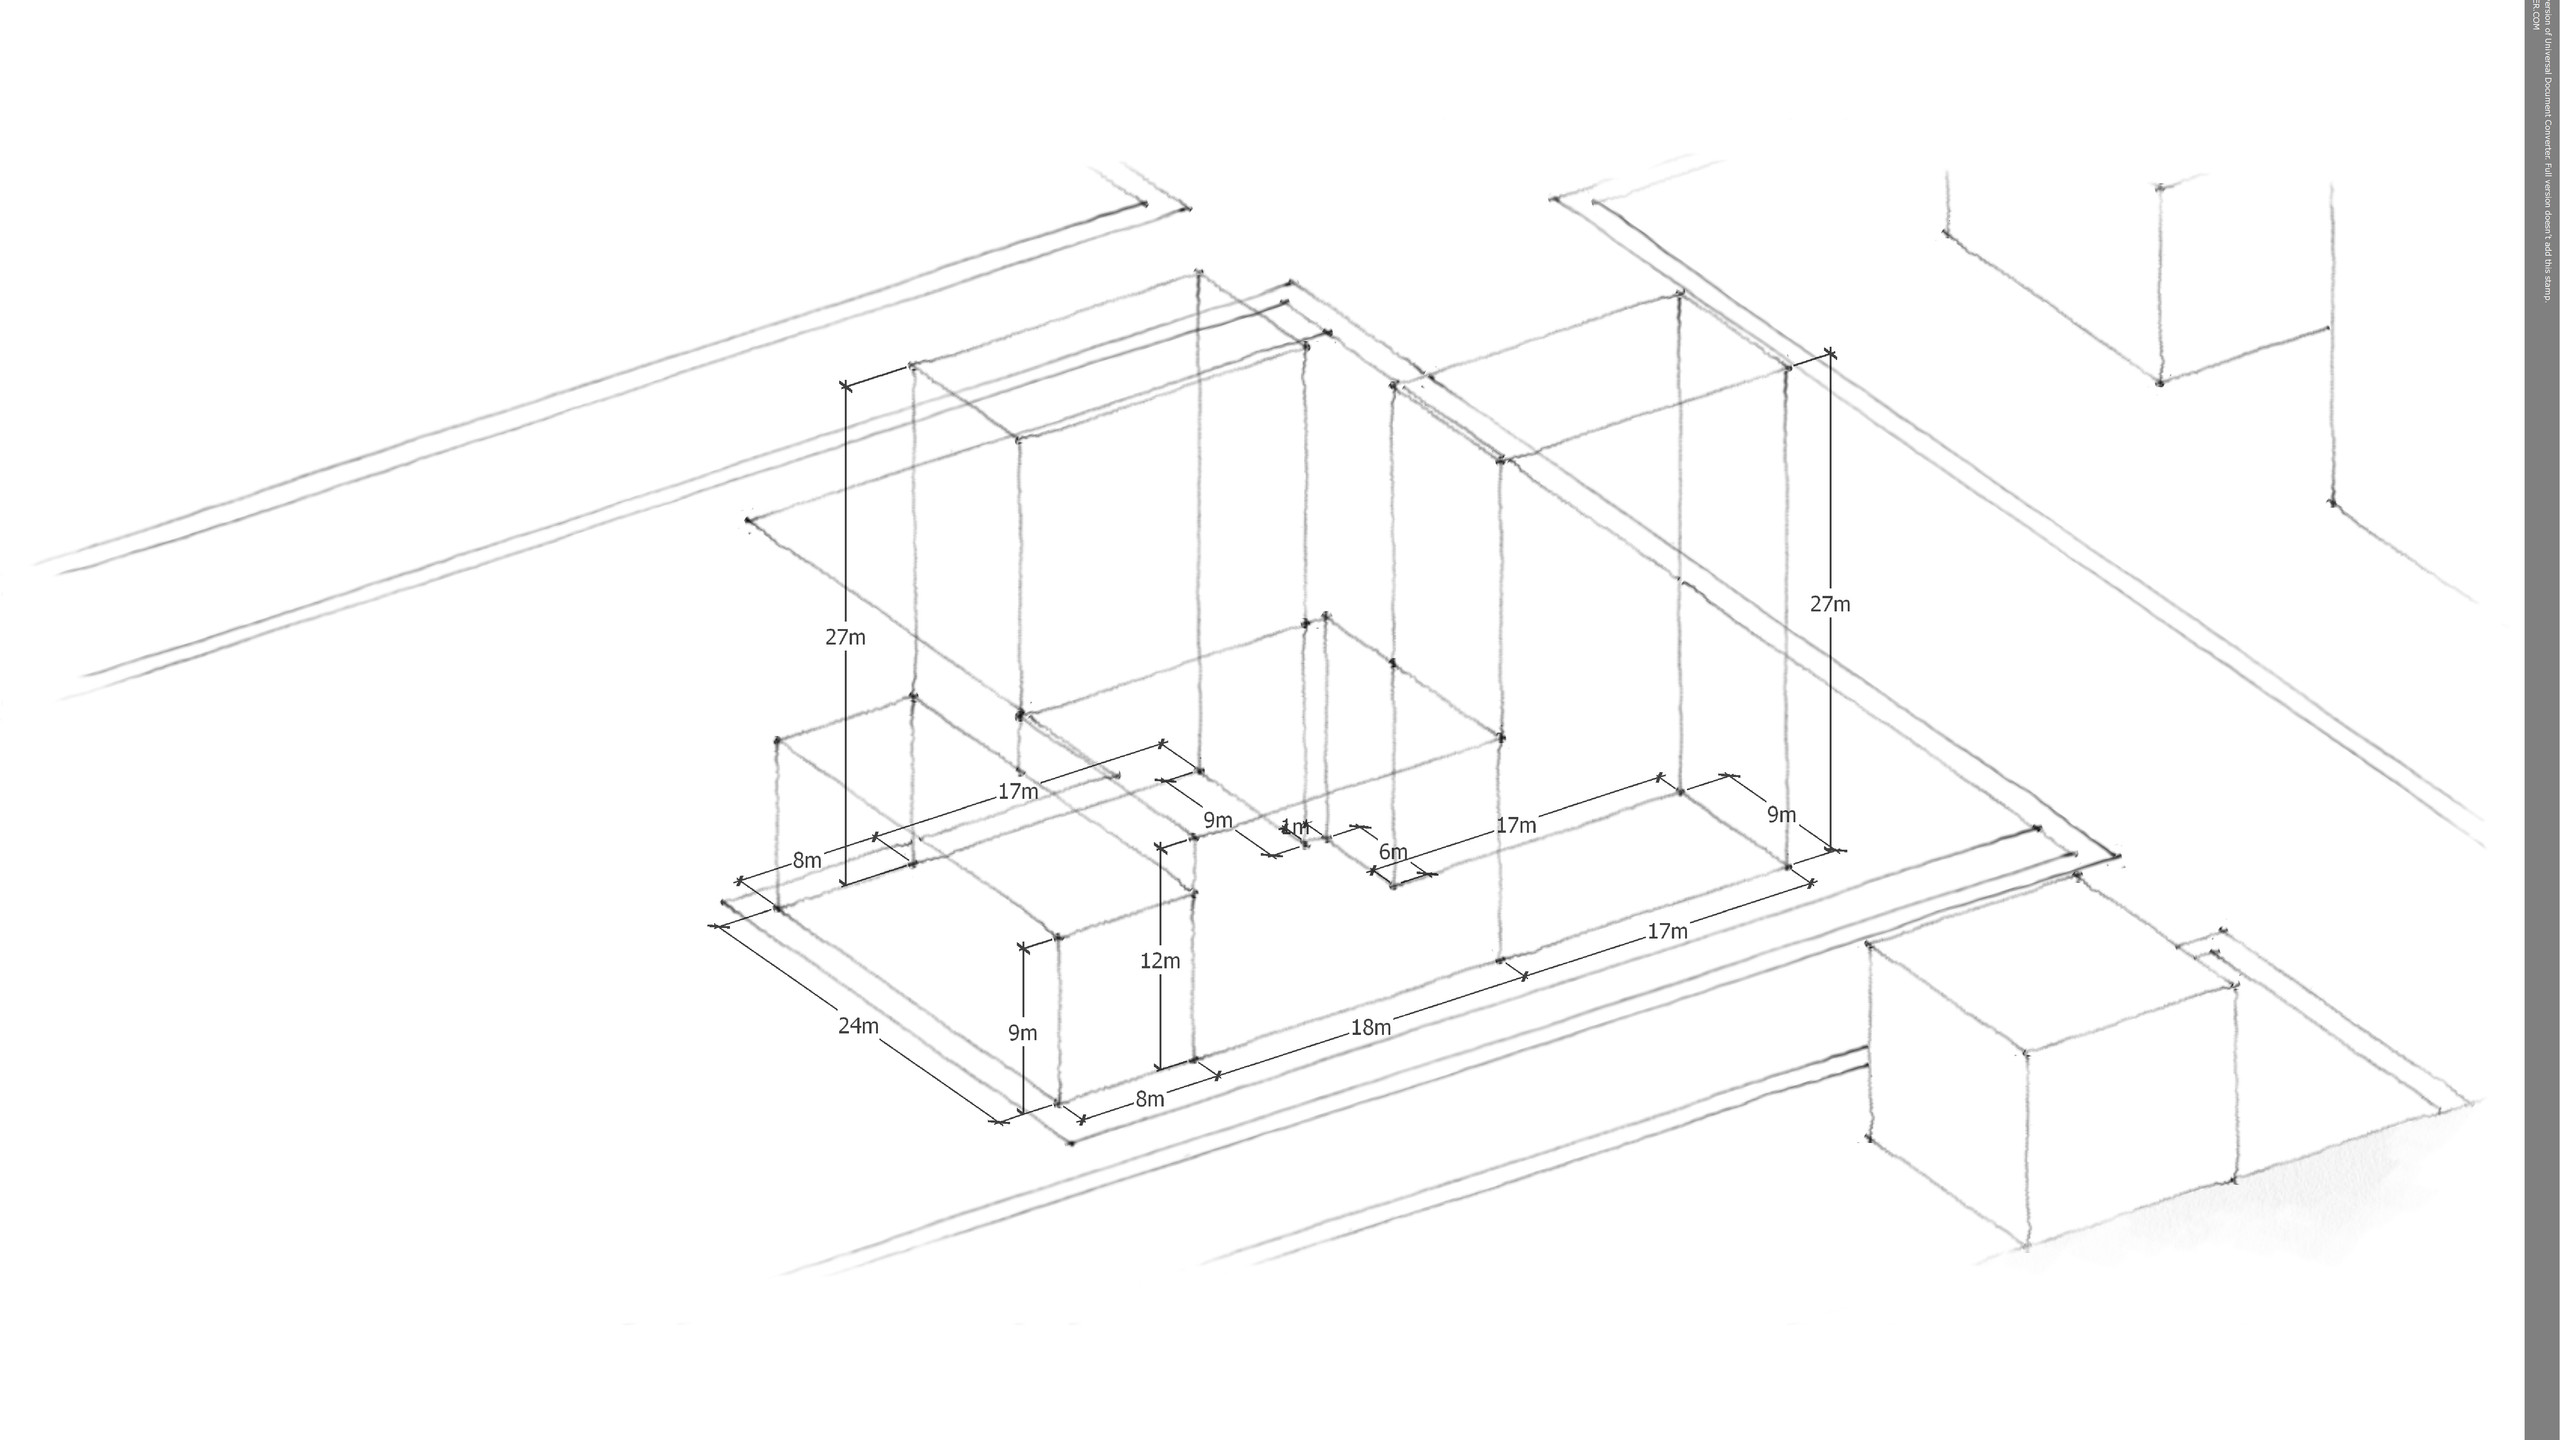 iso massing layout ideas b